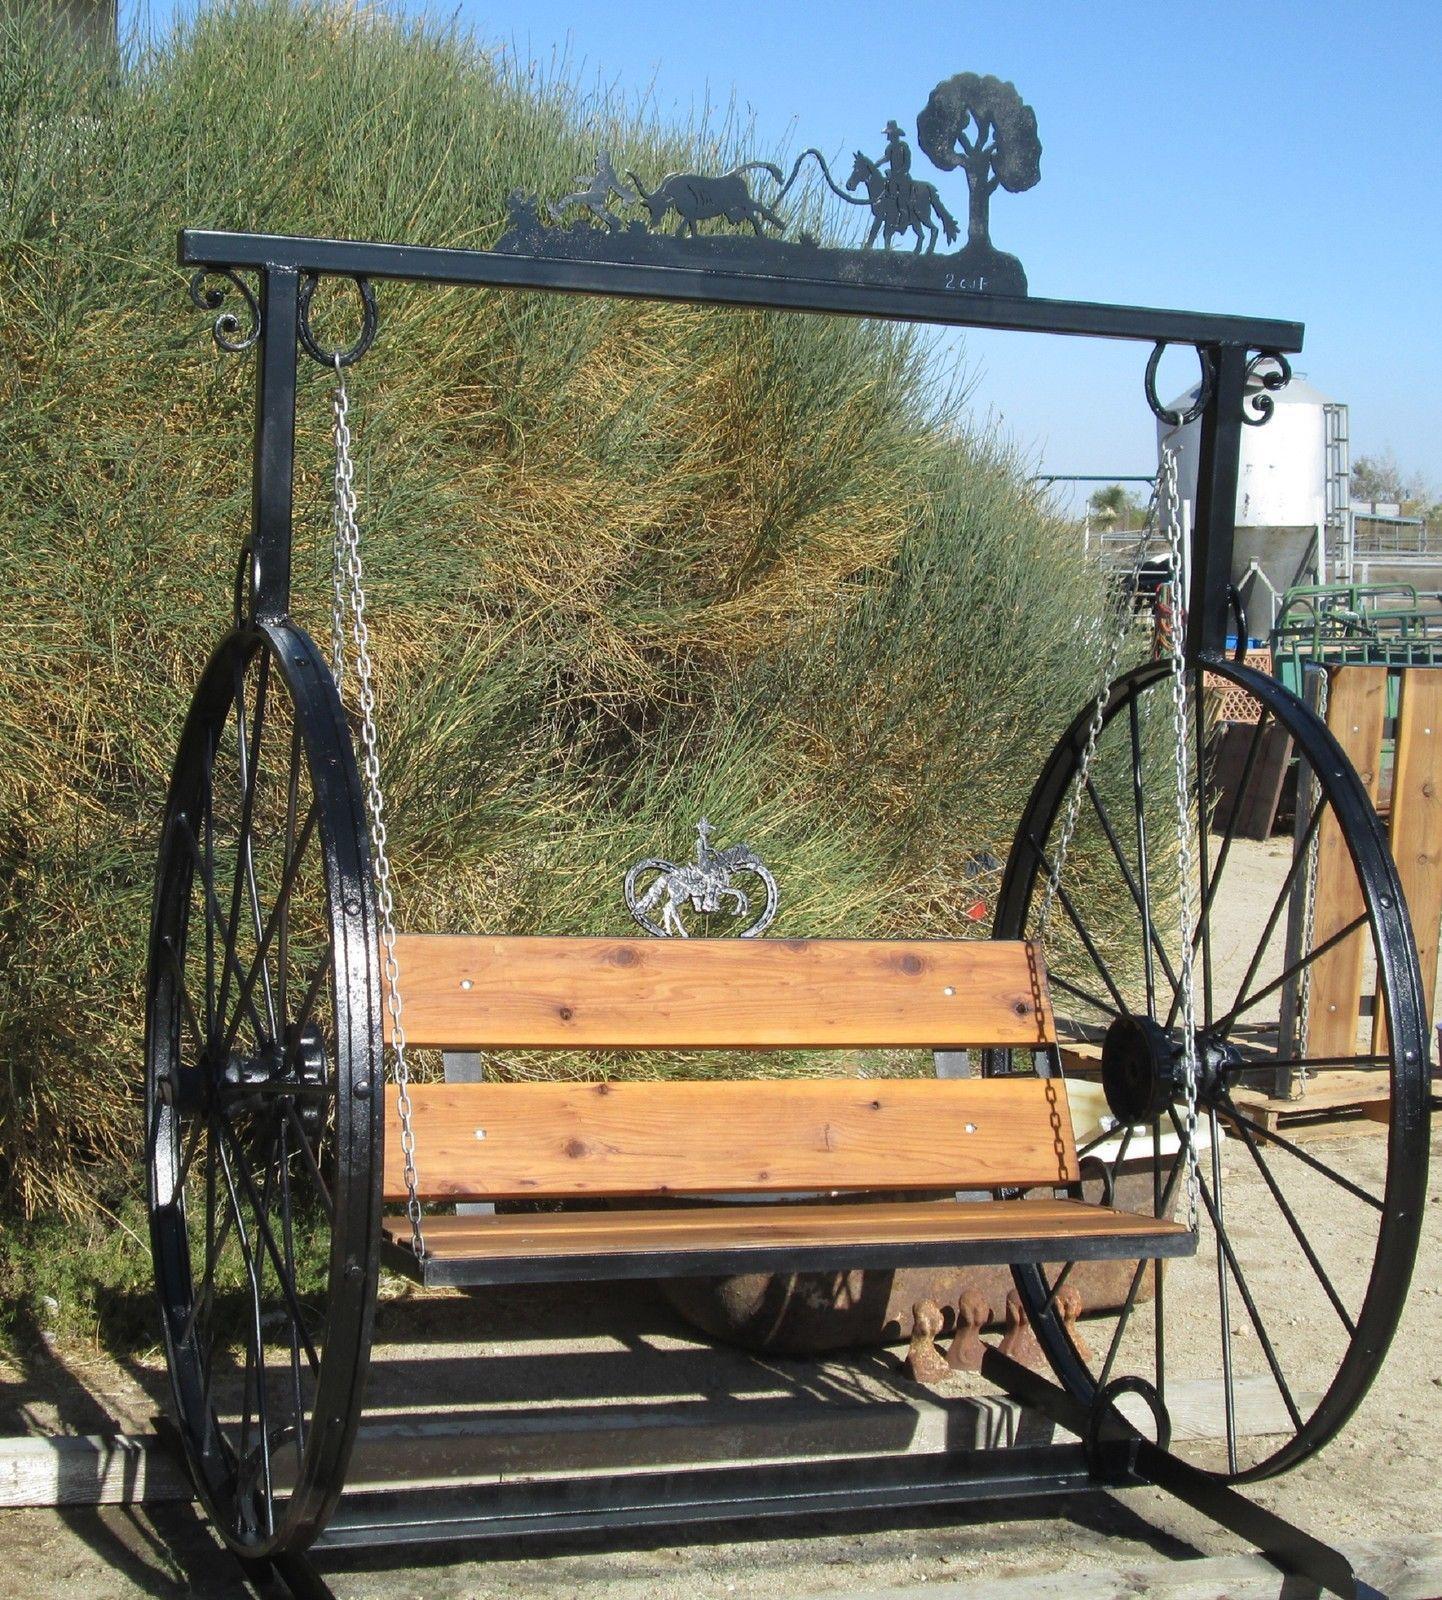 Garden Swing Hand Made W 100 Yr Old Hay Rake Wheels Steel